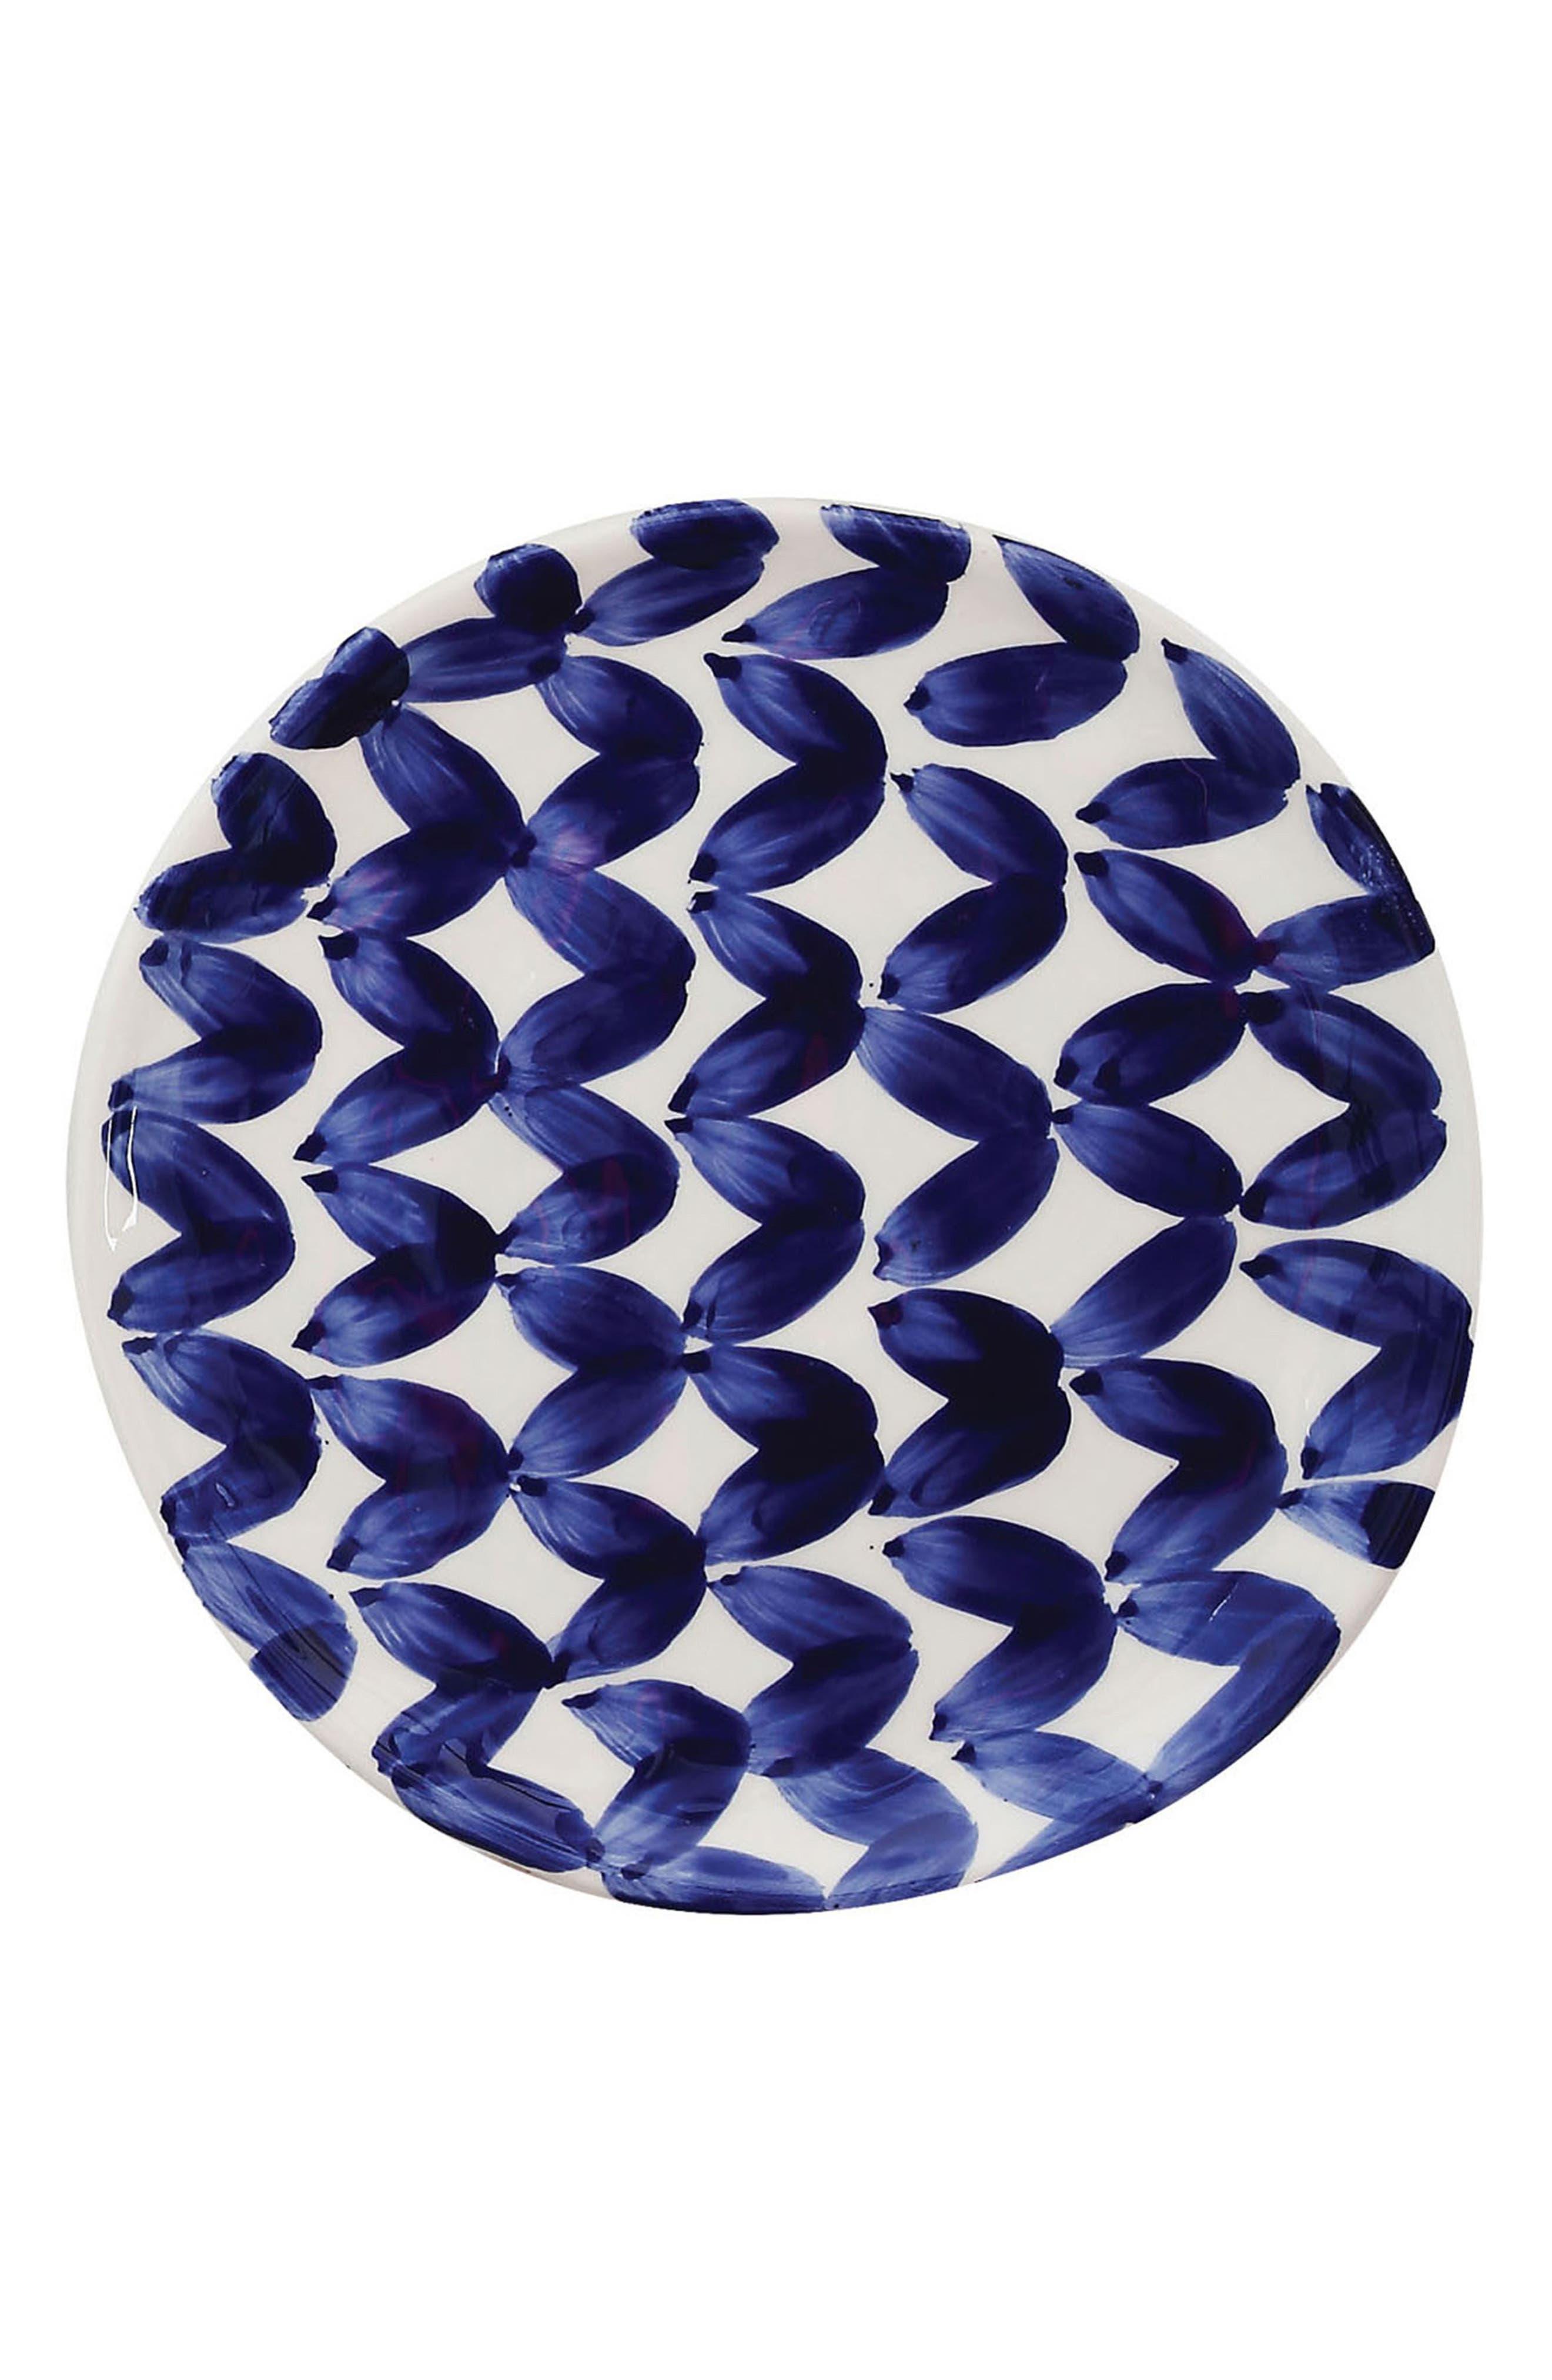 Blue & White Plate,                         Main,                         color, Blue